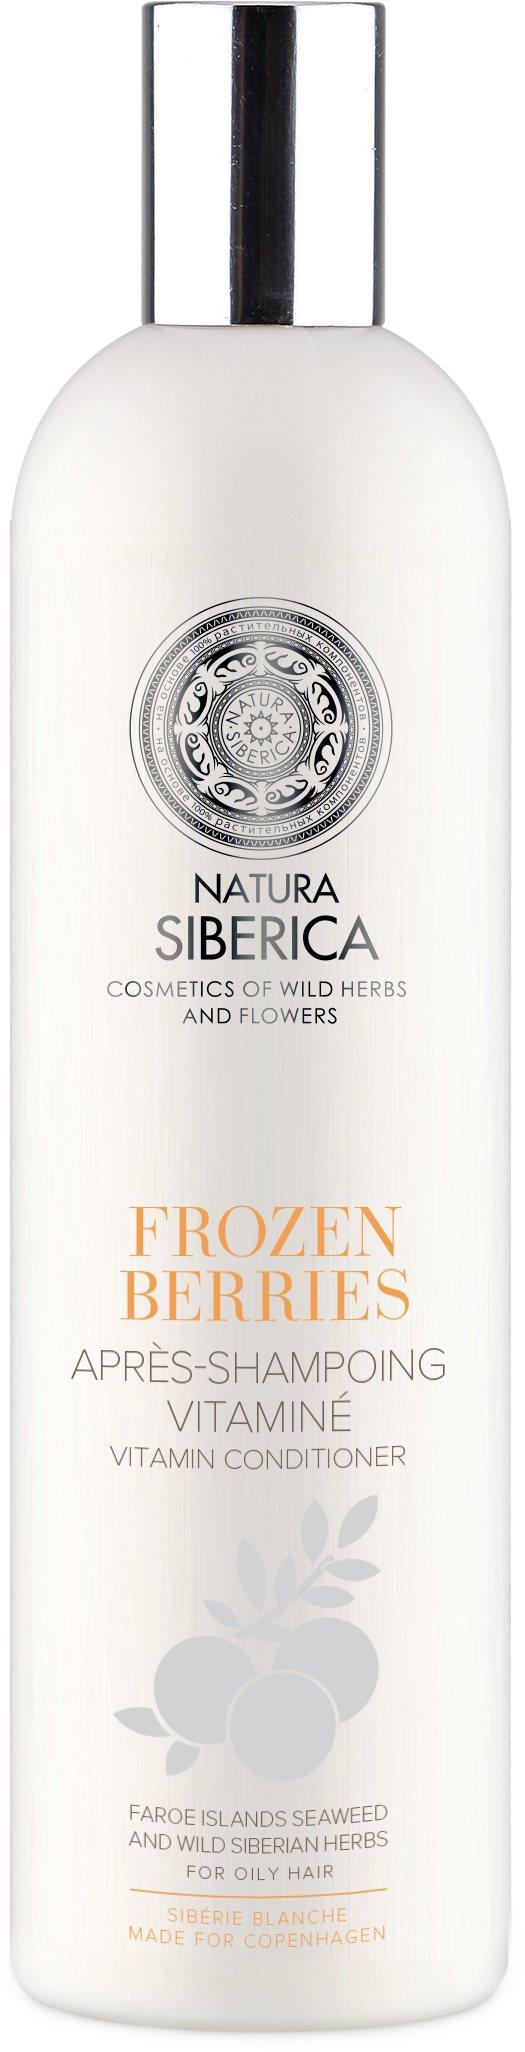 NATURA SIBERICA Frozen Berries Vitamin Conditioner 400 ml